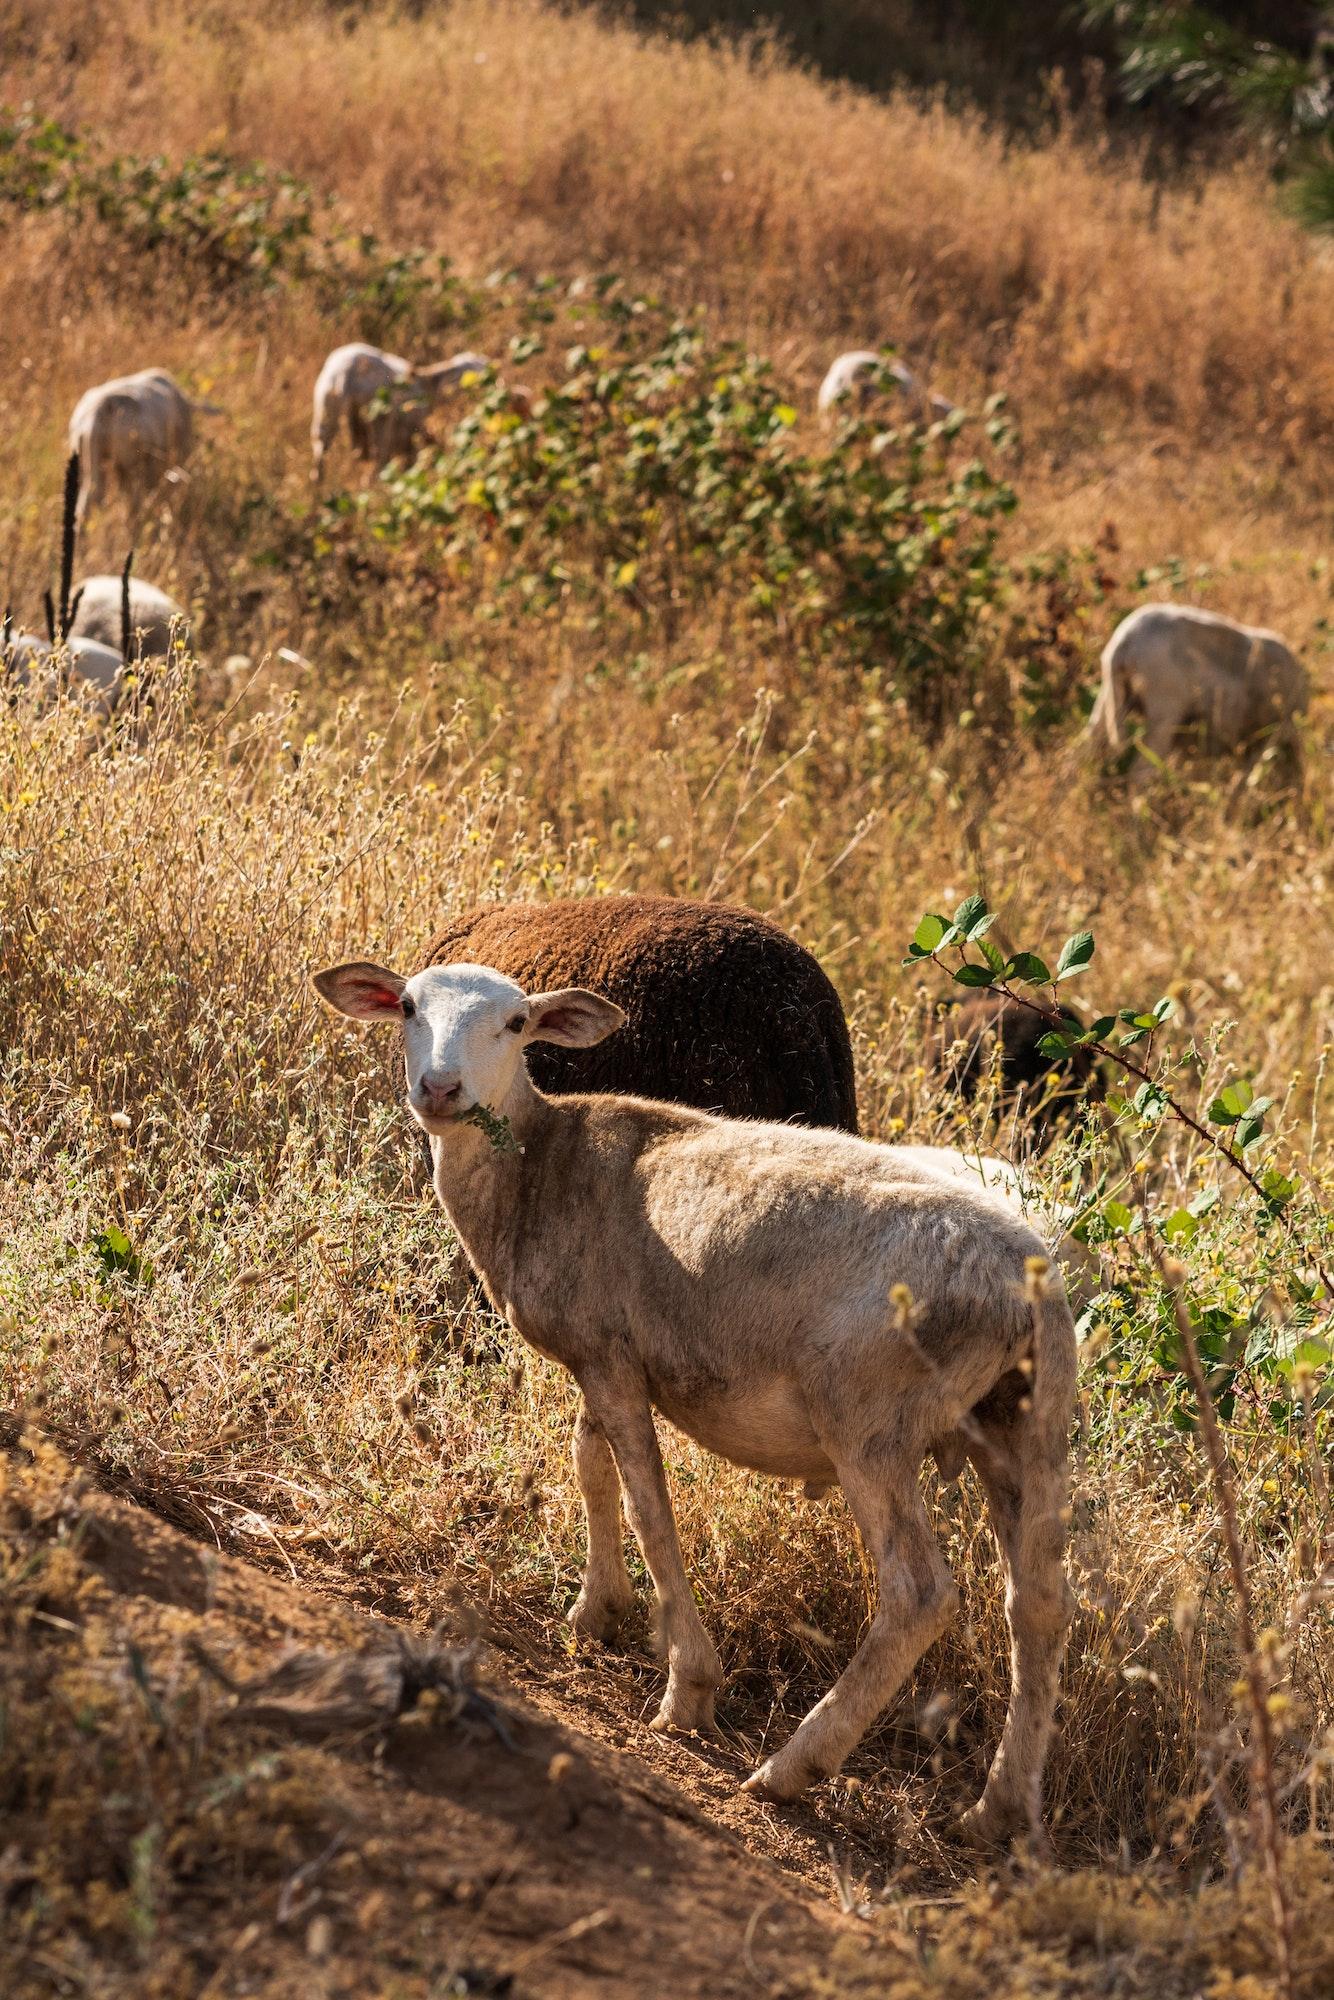 May contain: sheep, mammal, animal, bird, and ground